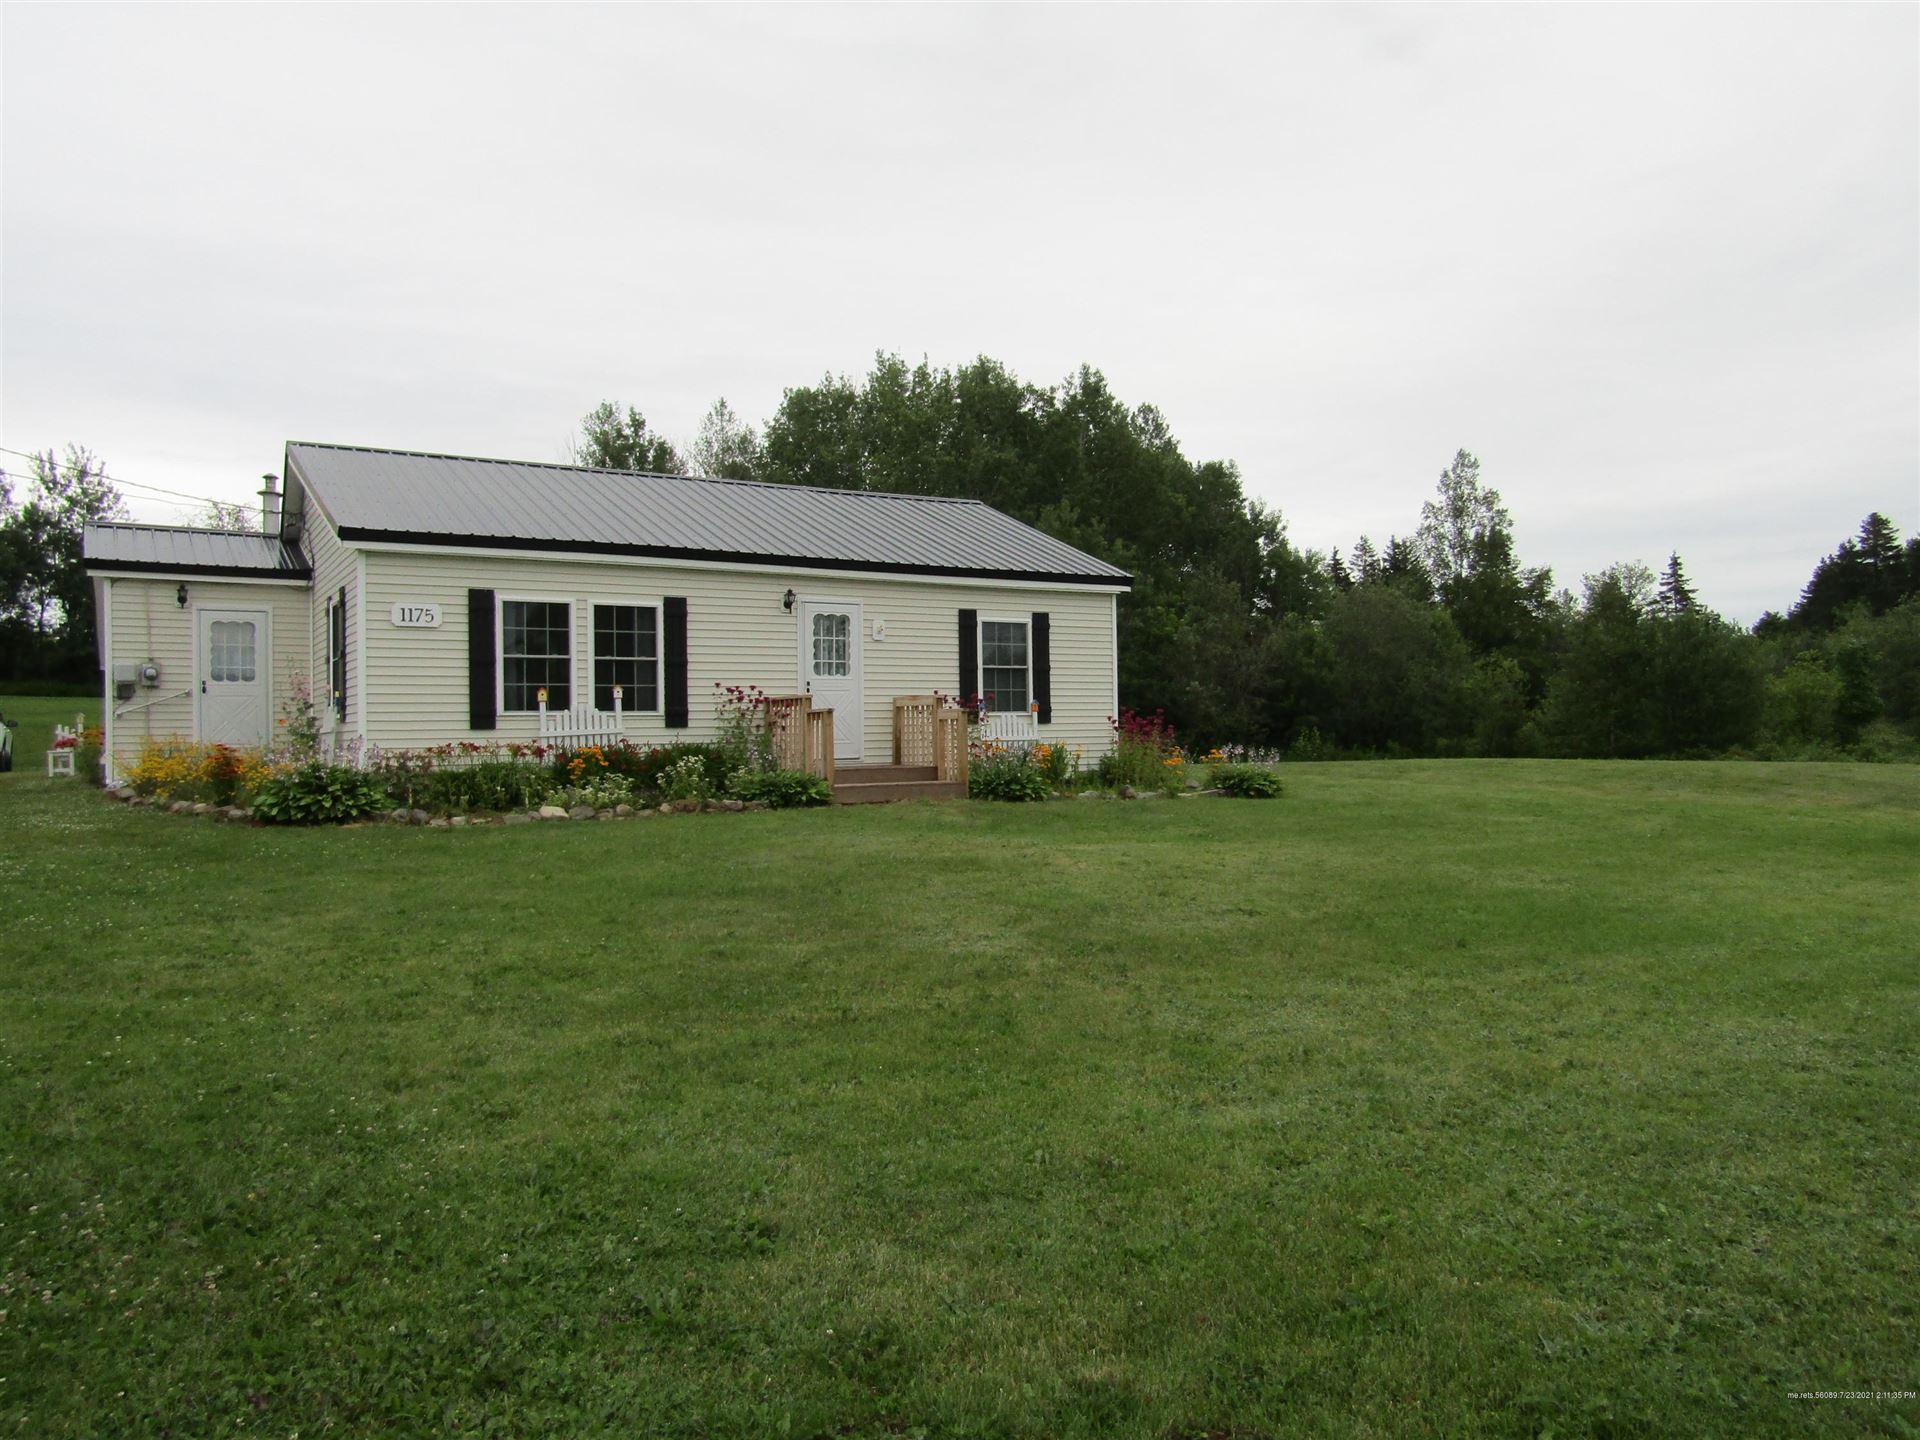 Photo of 1175 New Sweden Road Road #1, Woodland, ME 04736 (MLS # 1501964)